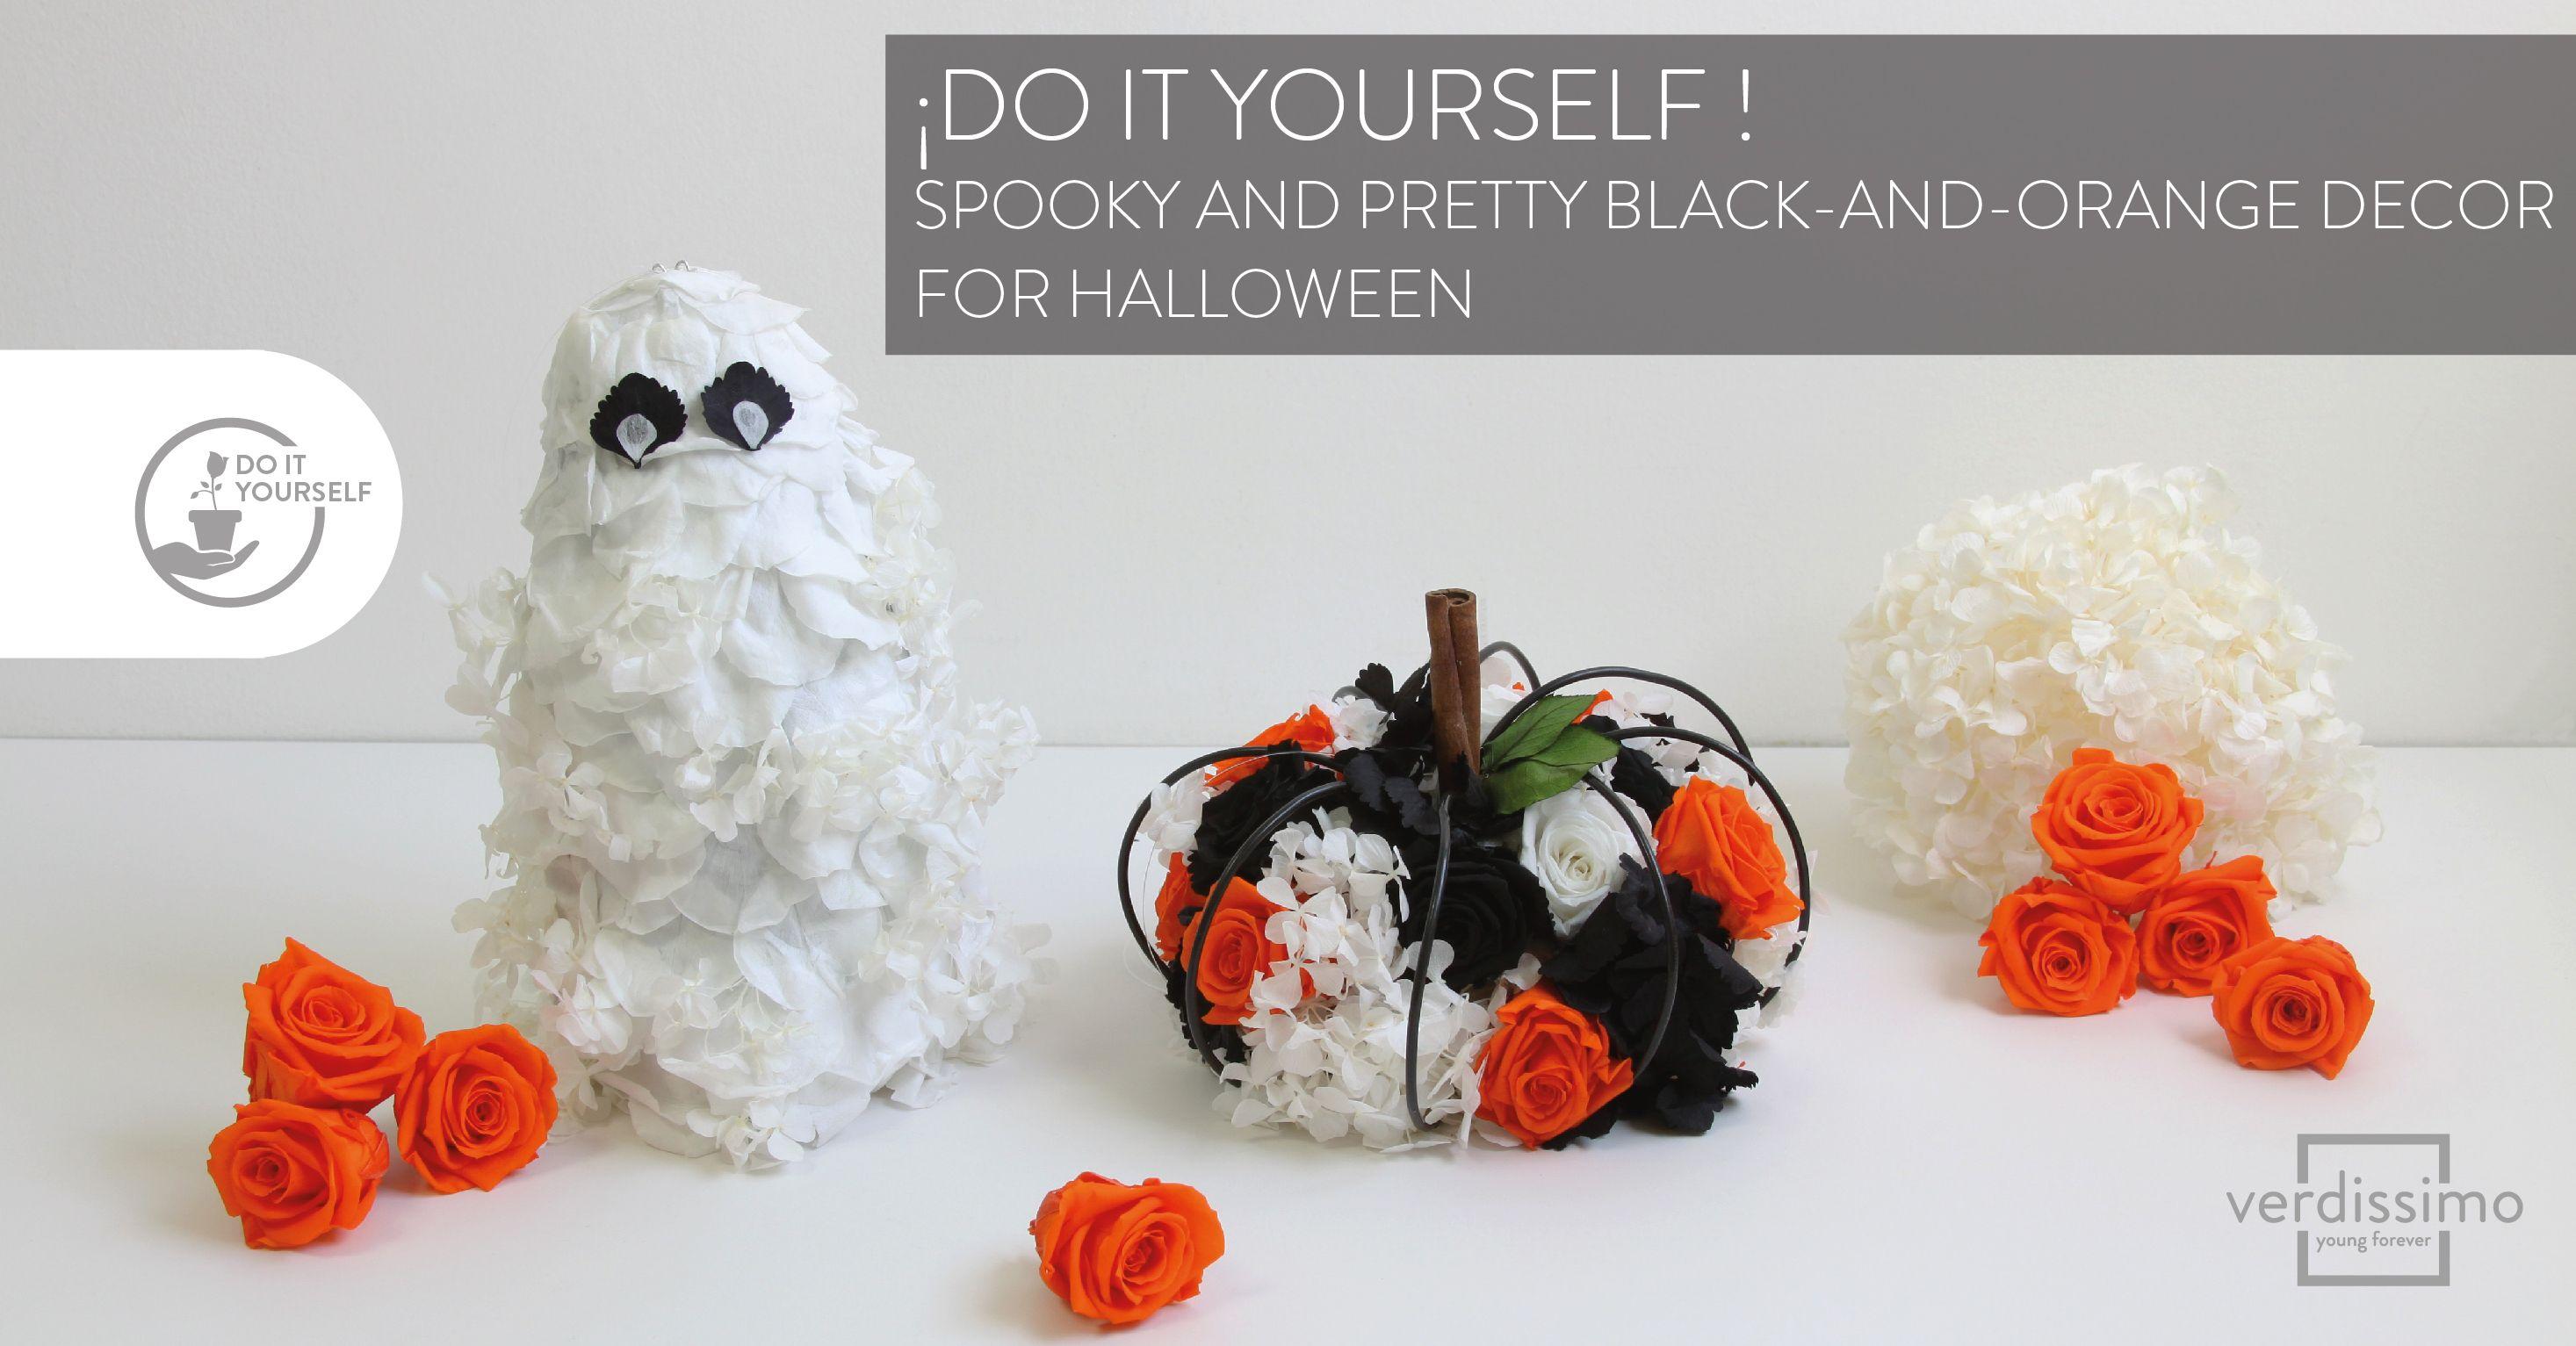 Do it yourself! Spooky and pretty black-and-orange decor for Halloween - Verdissimo